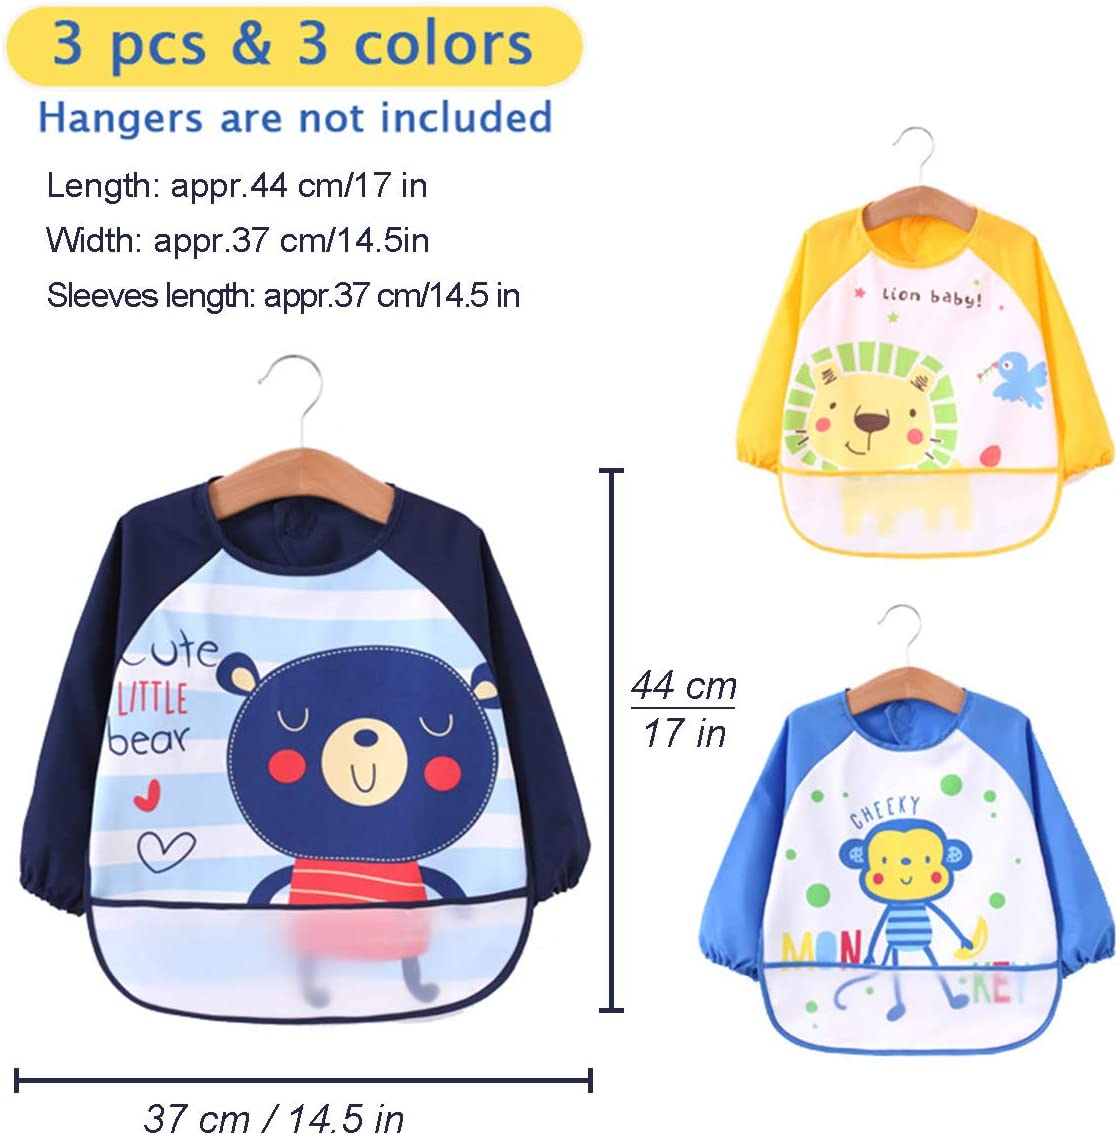 3pcs Kids Boy Bibs Waterproof Long Sleeve Girl Bibs Kids Burp Cloth Feeding Bib with Pocket Child Apron Smock 6-36 Months